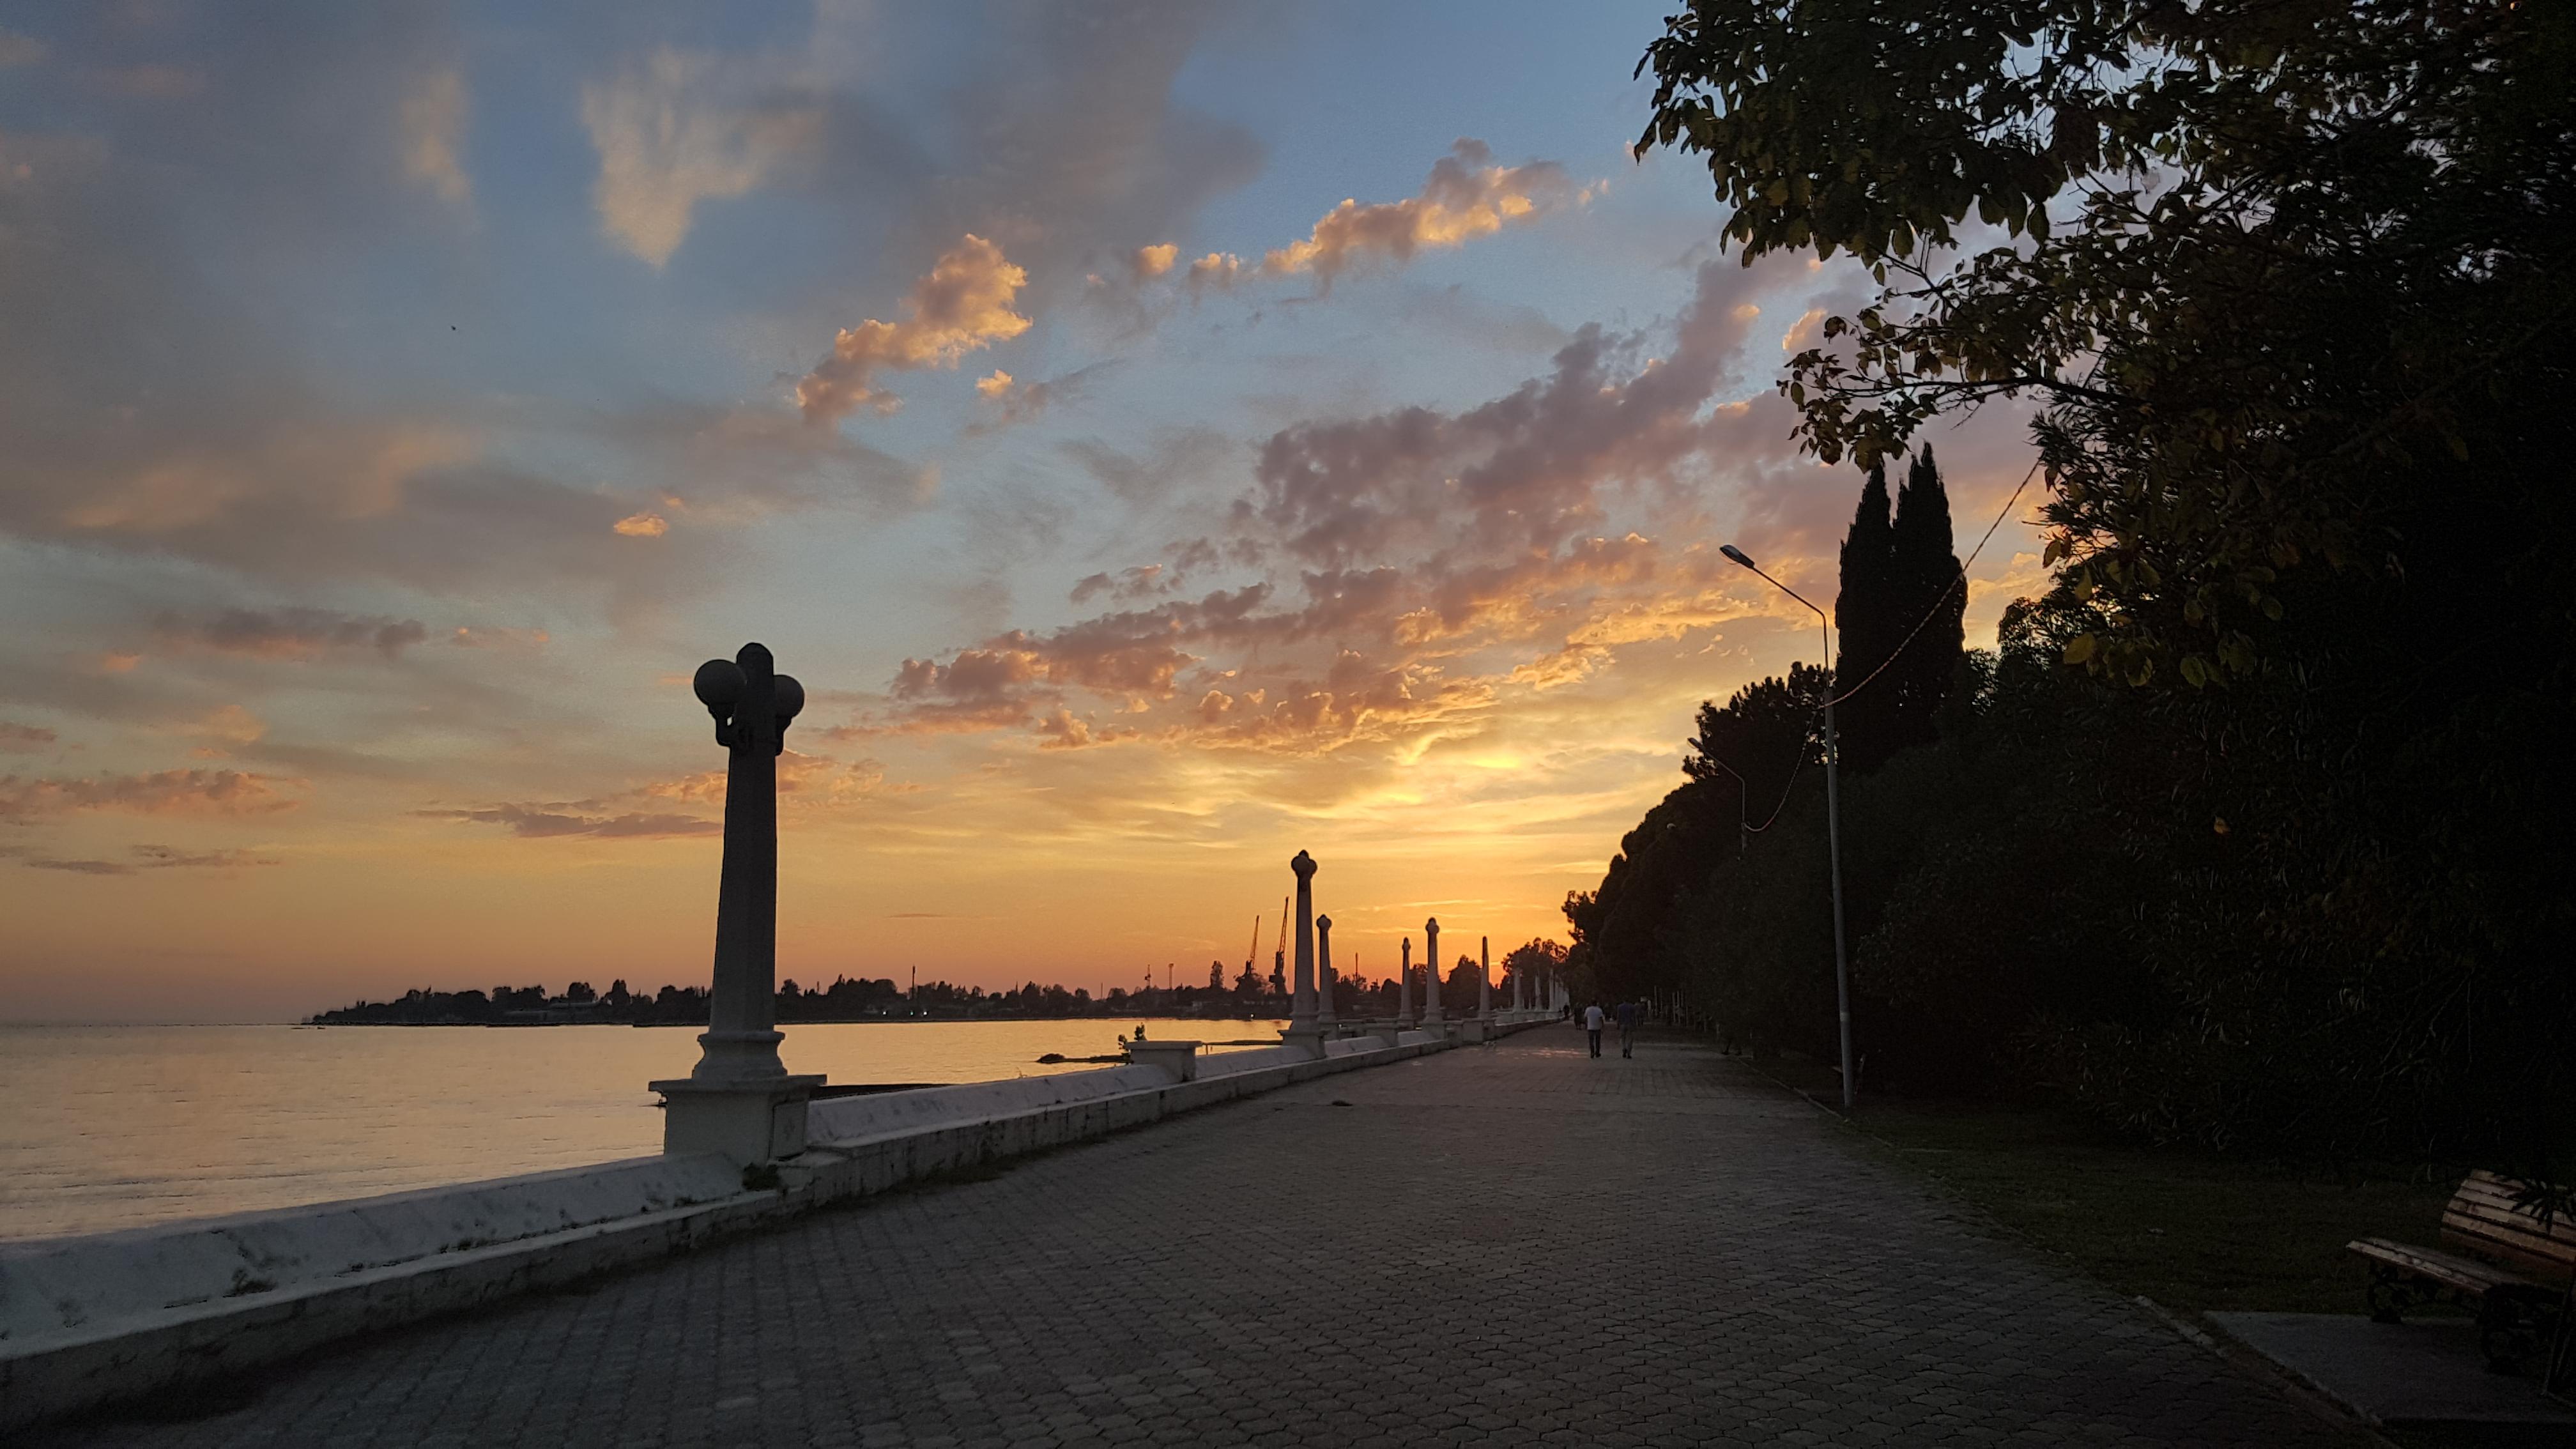 Walking around the coast in Sukhumi, the capital of Abkhazia